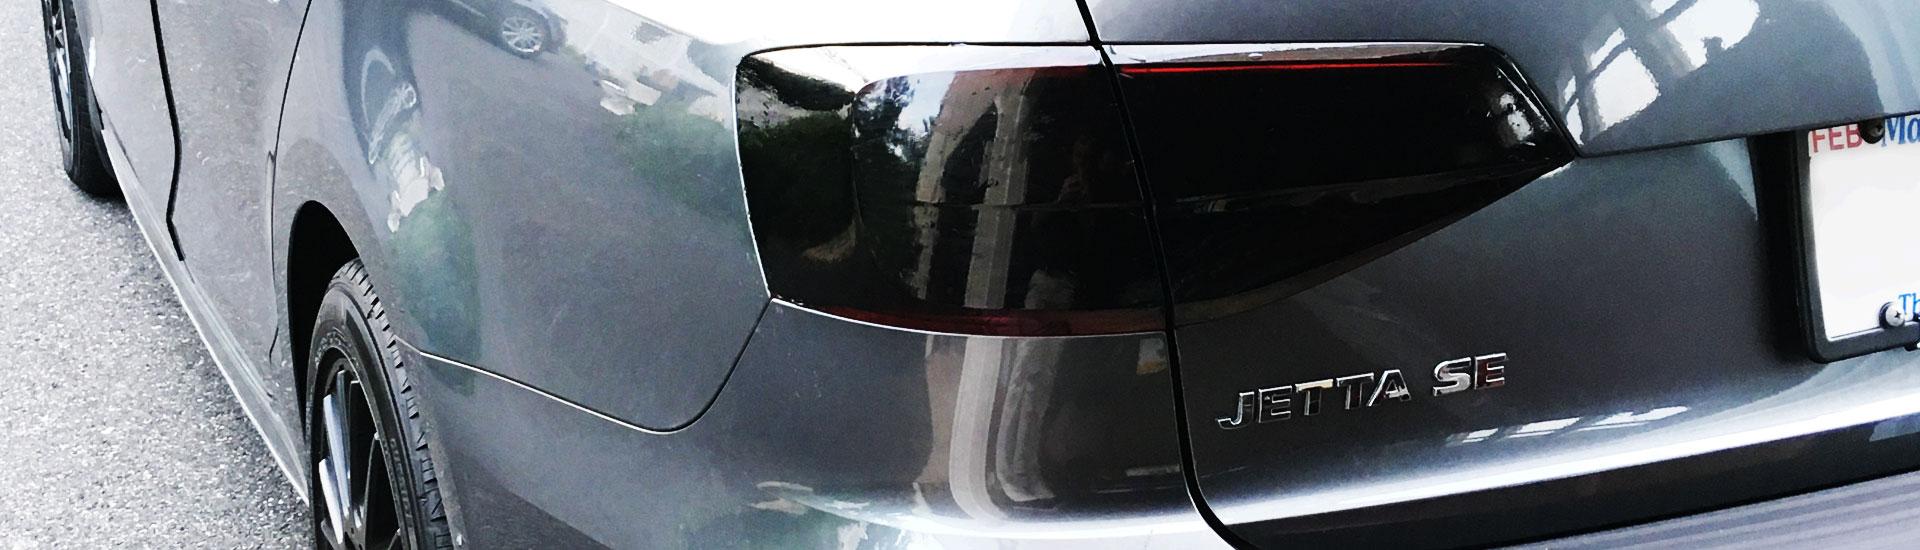 Volkswagen Jetta Tail Light Tint Covers